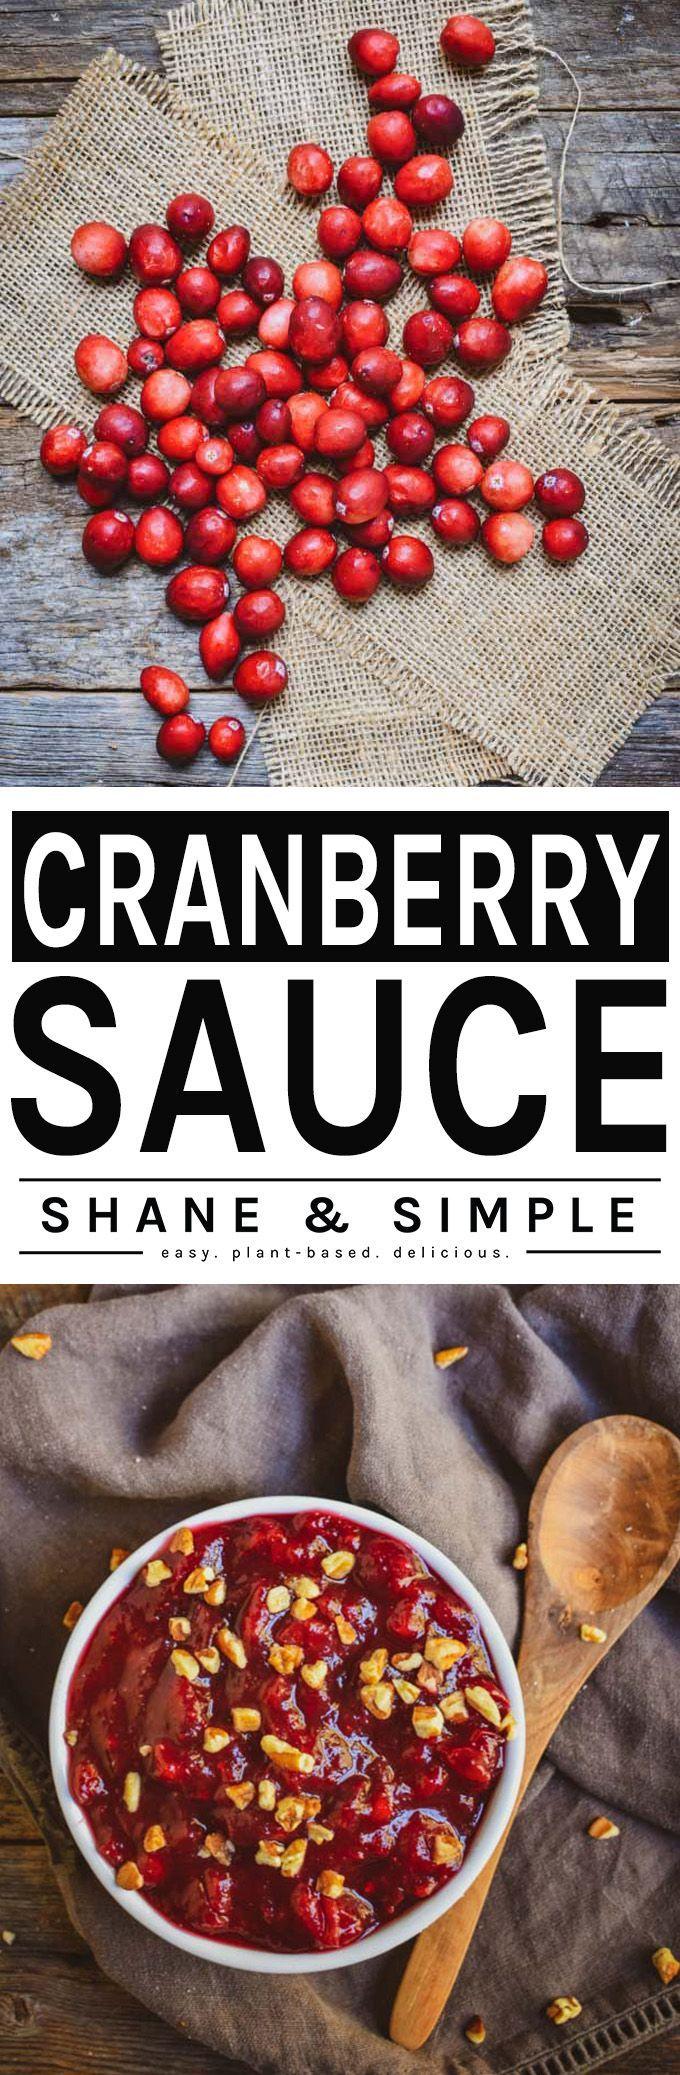 Cranberry Sauce Recipe Plant Based Holiday Recipes